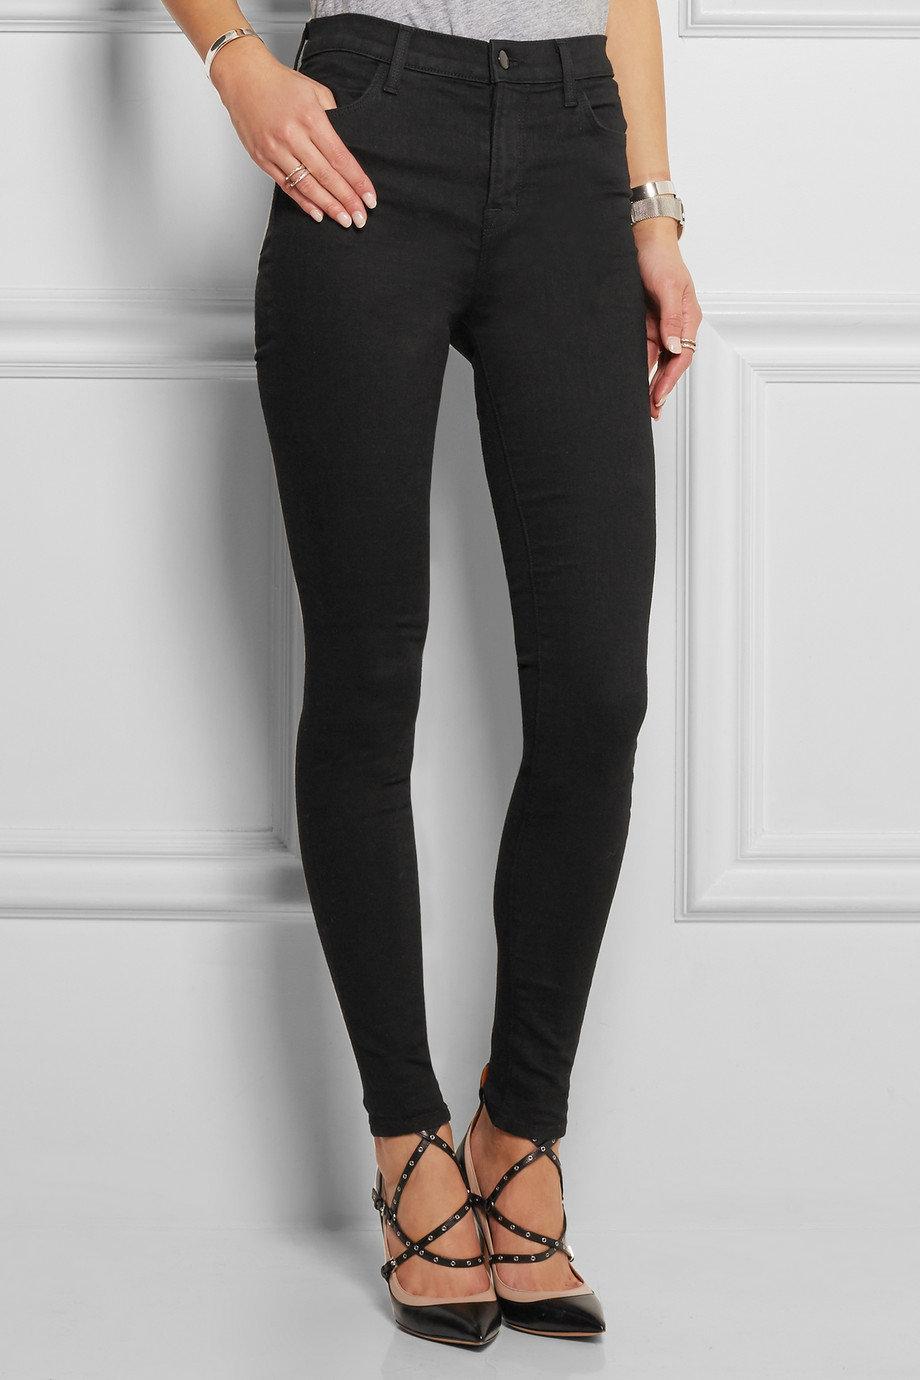 Black skinny jeans for big thighs